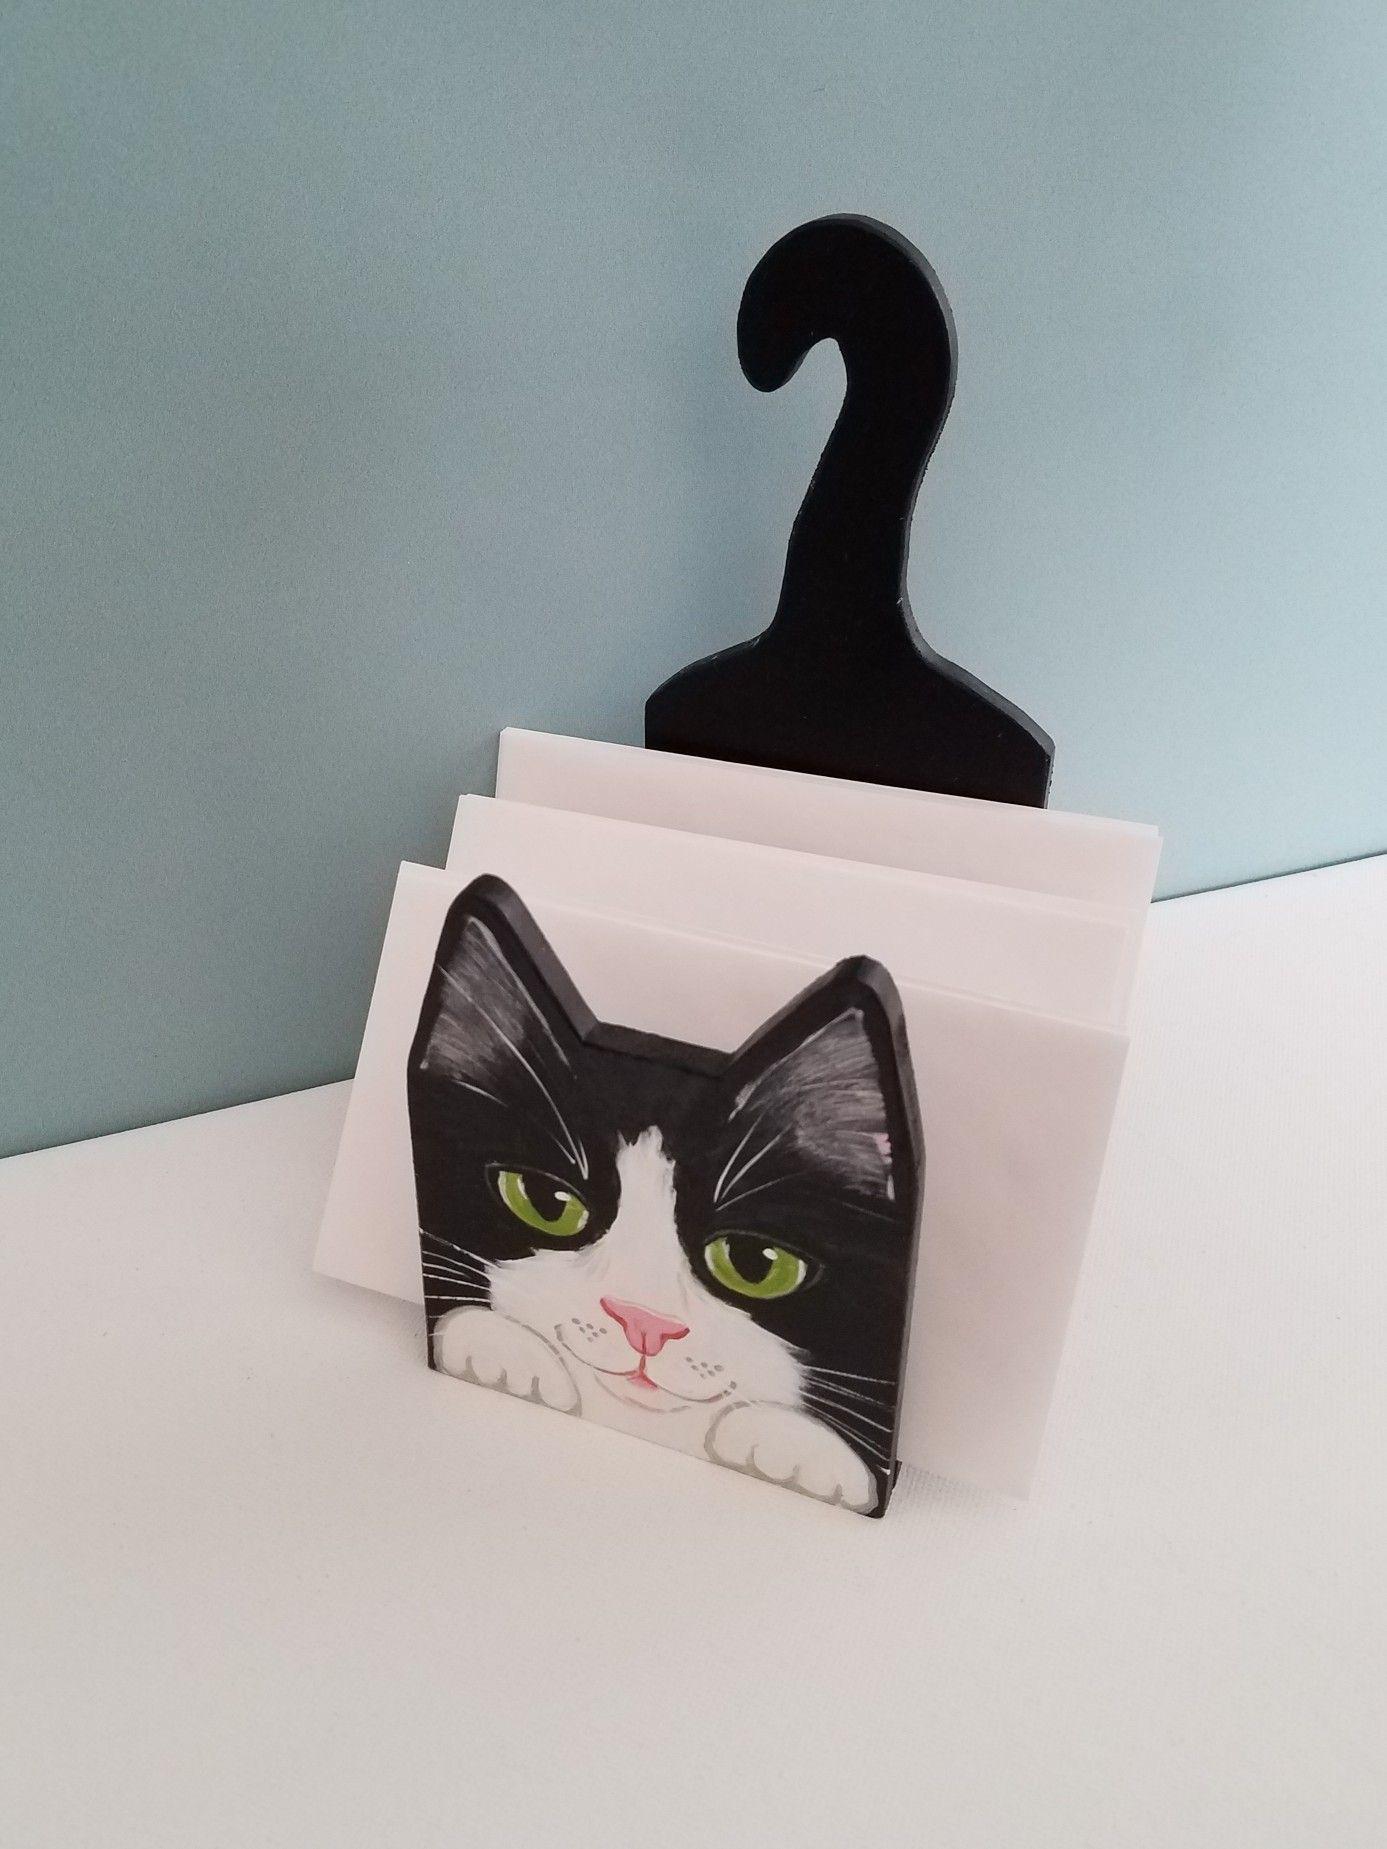 Cat Desk Organizer In Stock Or Custom Available Cat Memorial Gift Unique Items Products Custom Cat Portrait